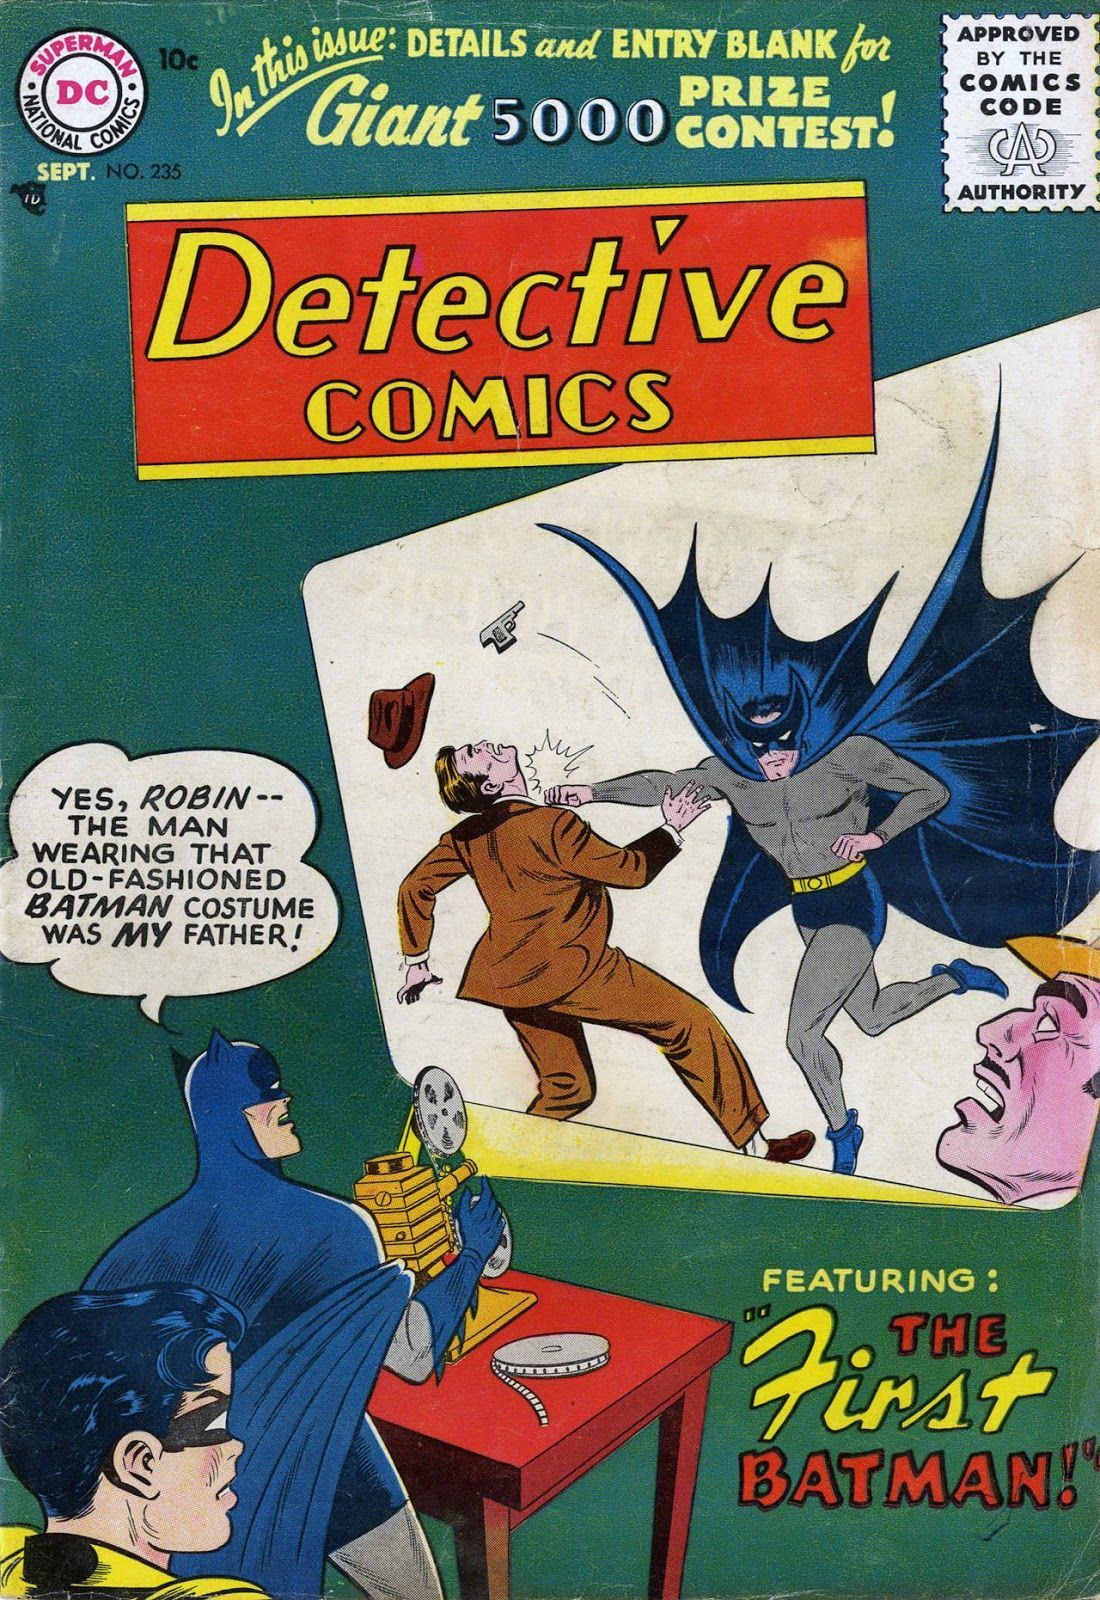 Detective Comics #235 (Writer: Bill Finger, Art: Sheldon Moldoff)